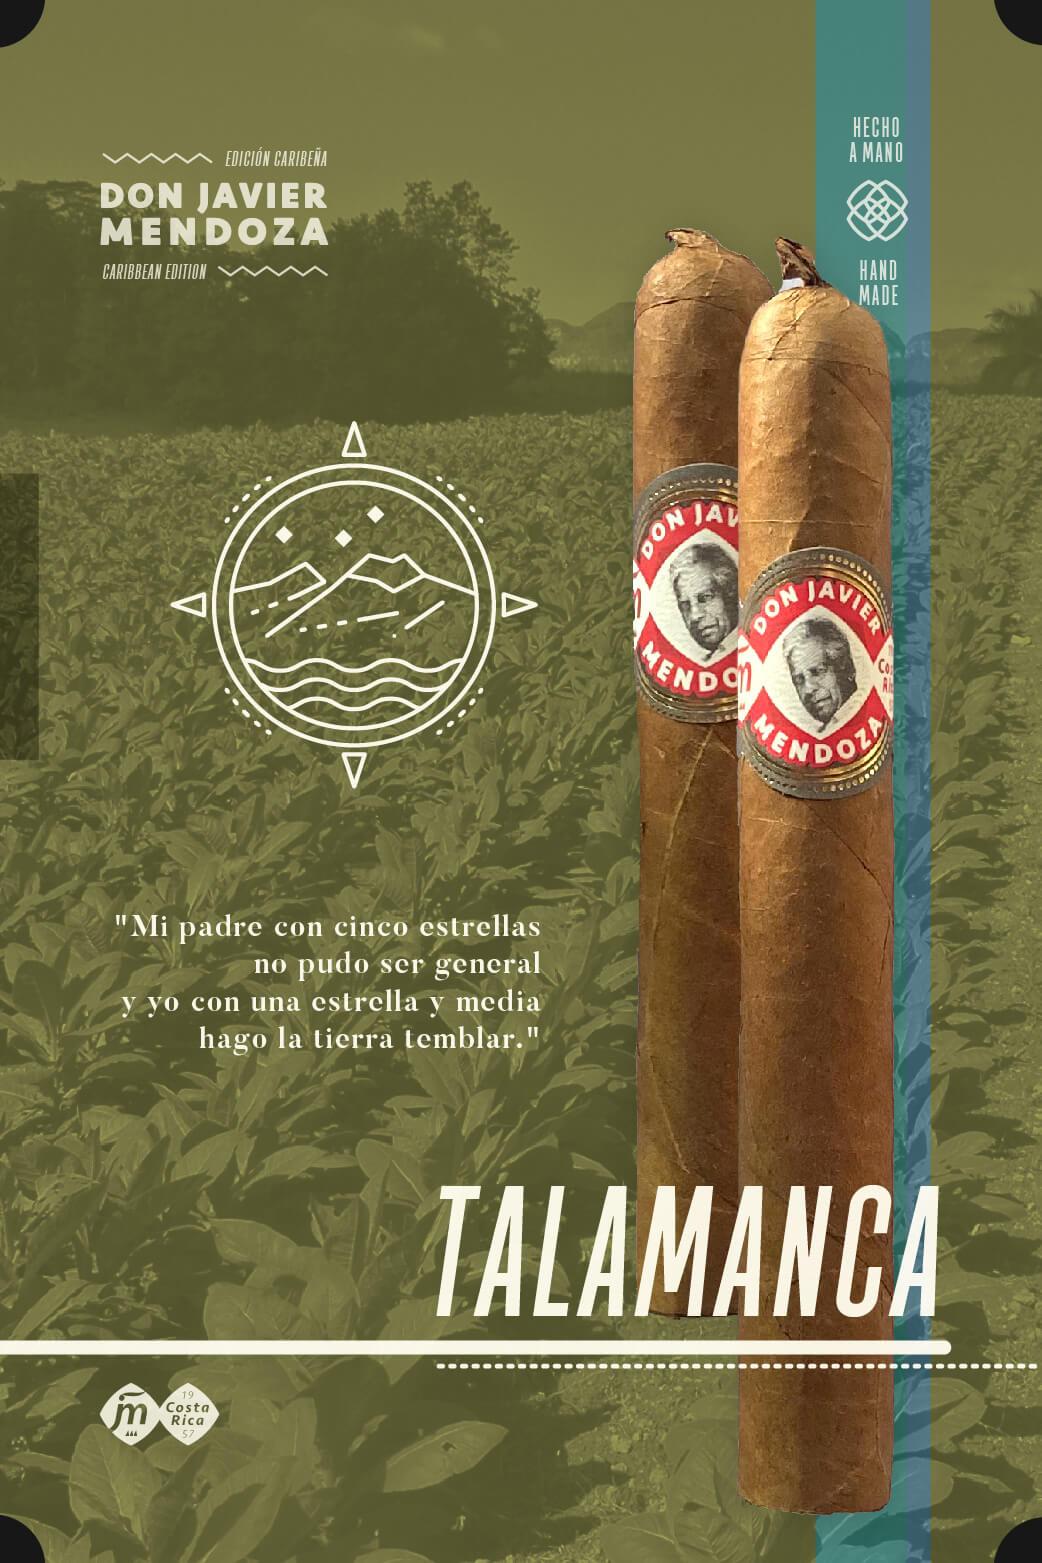 Don Javier Mendoza Talamanca